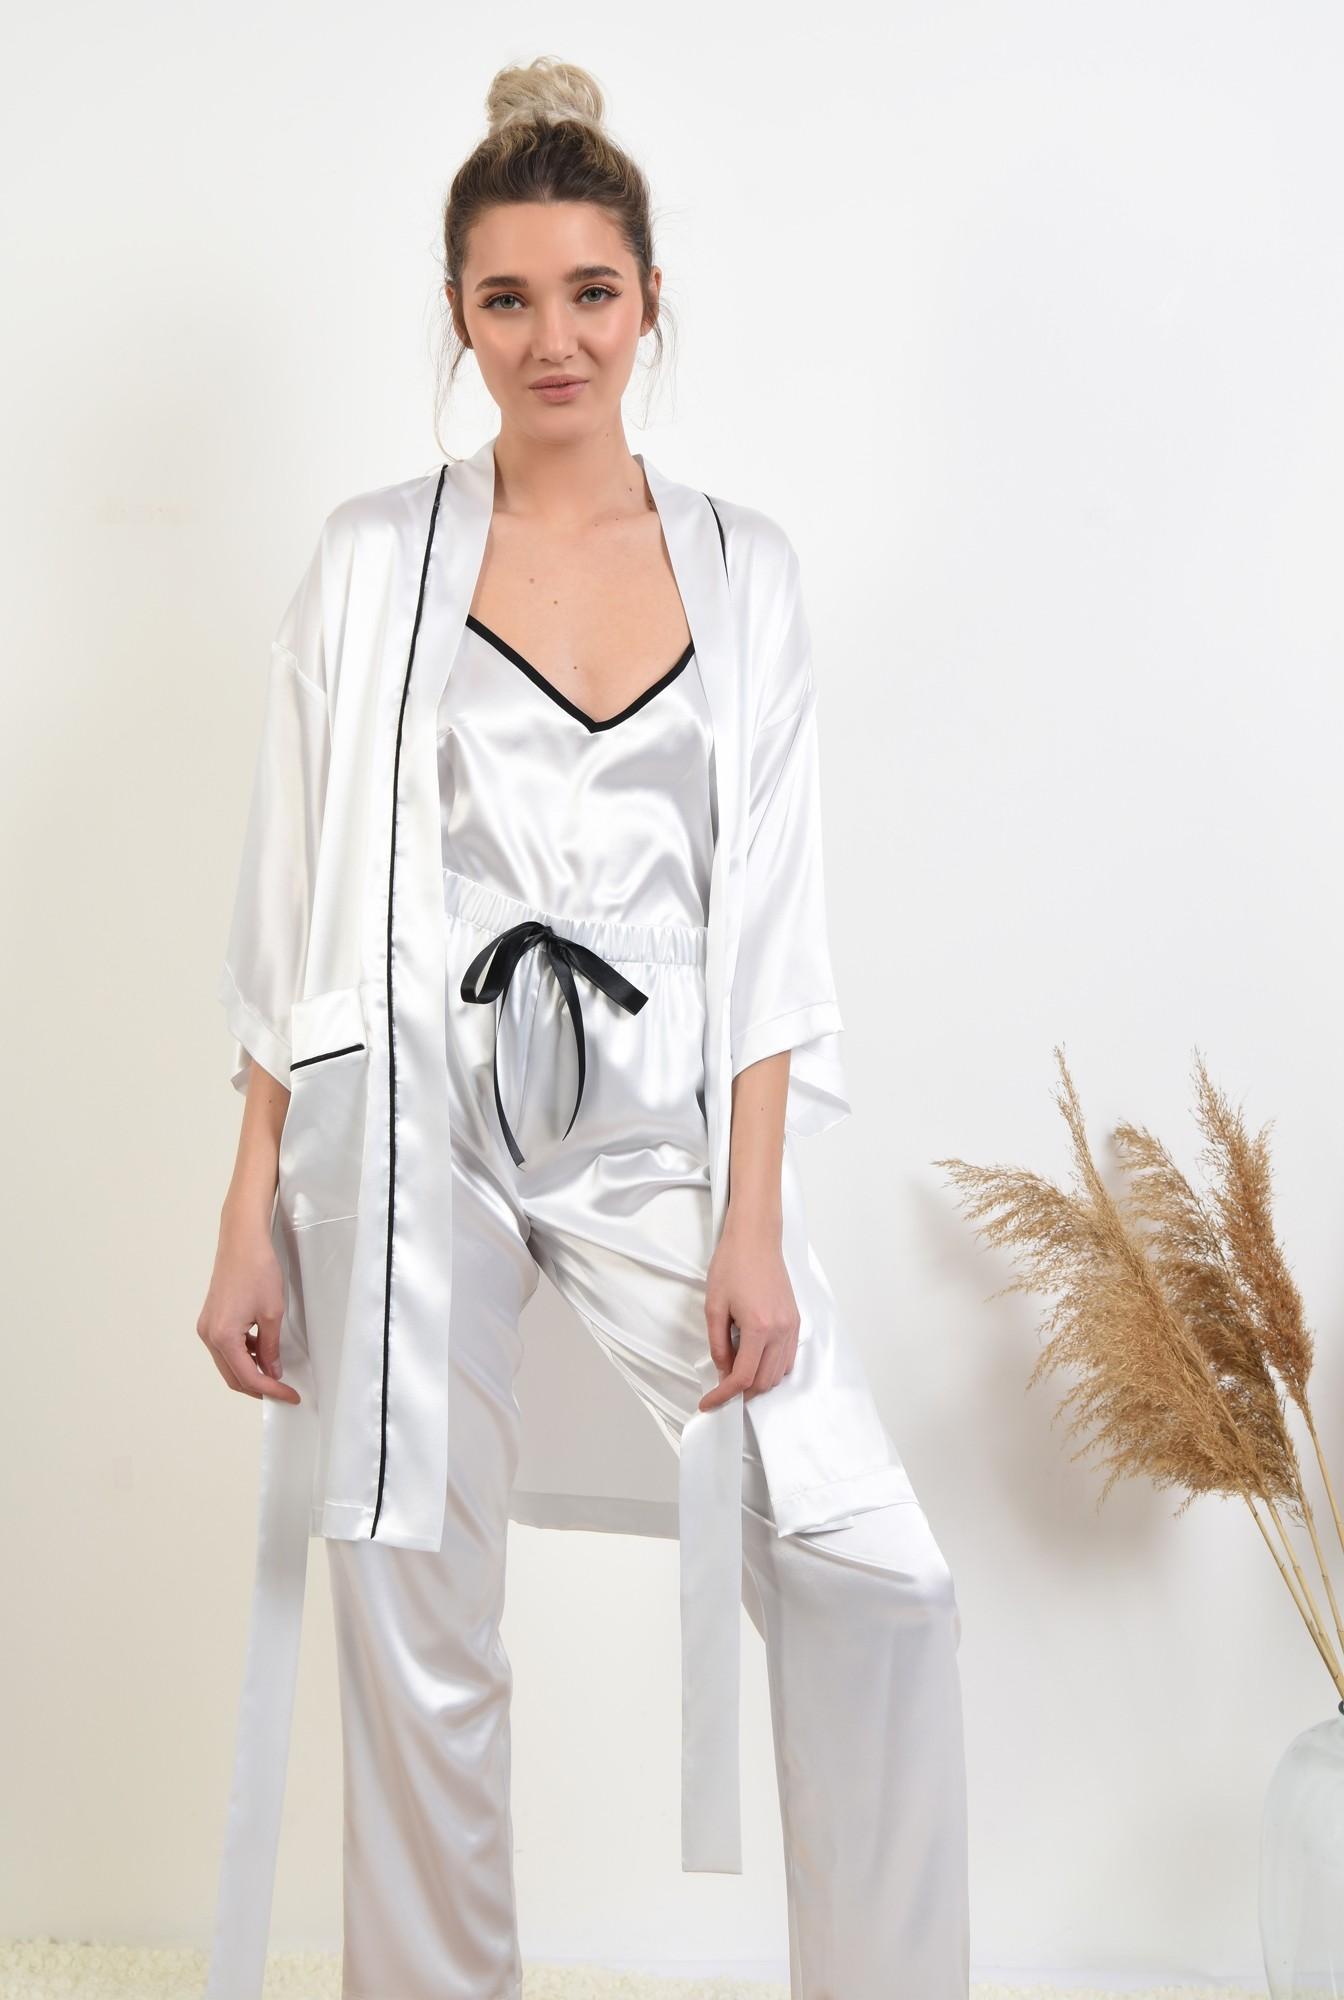 2 - pantaloni din satin, albi, lungi, cu funda in contrast